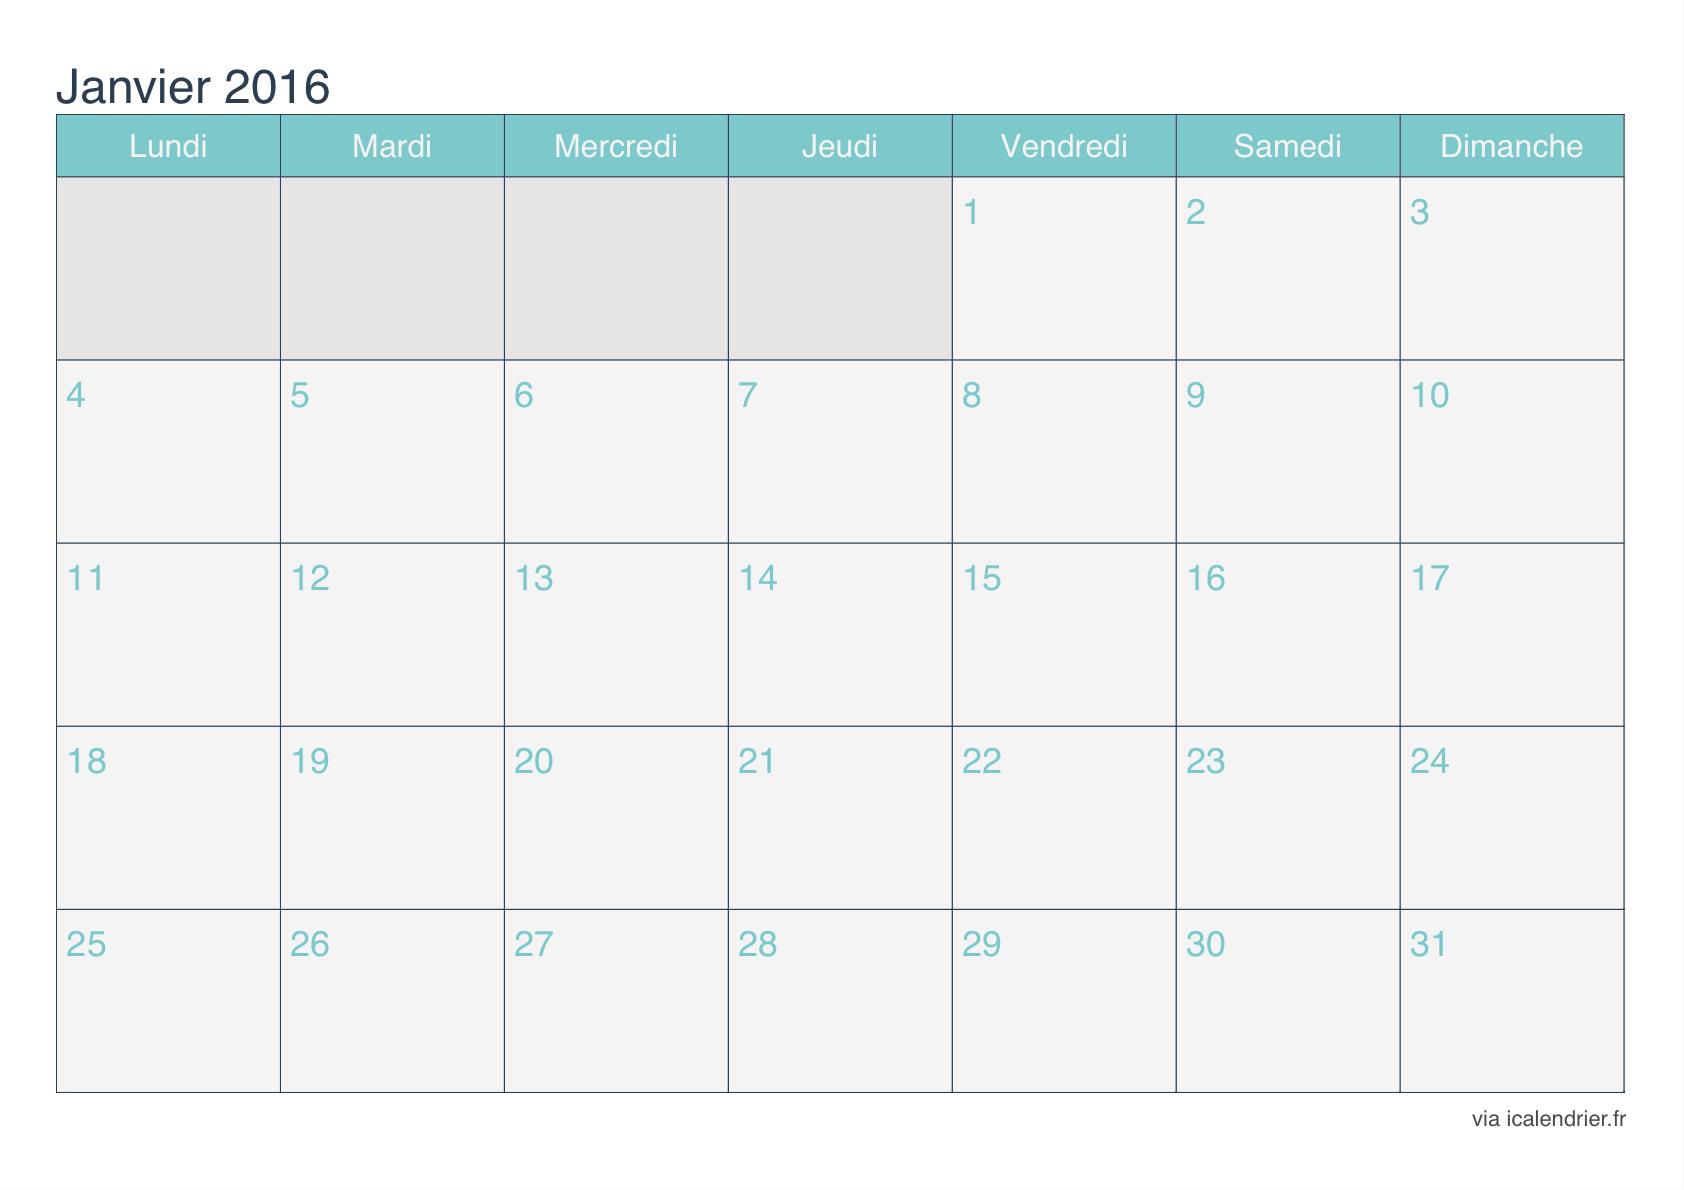 Agenda 2016 à imprimer gratuit